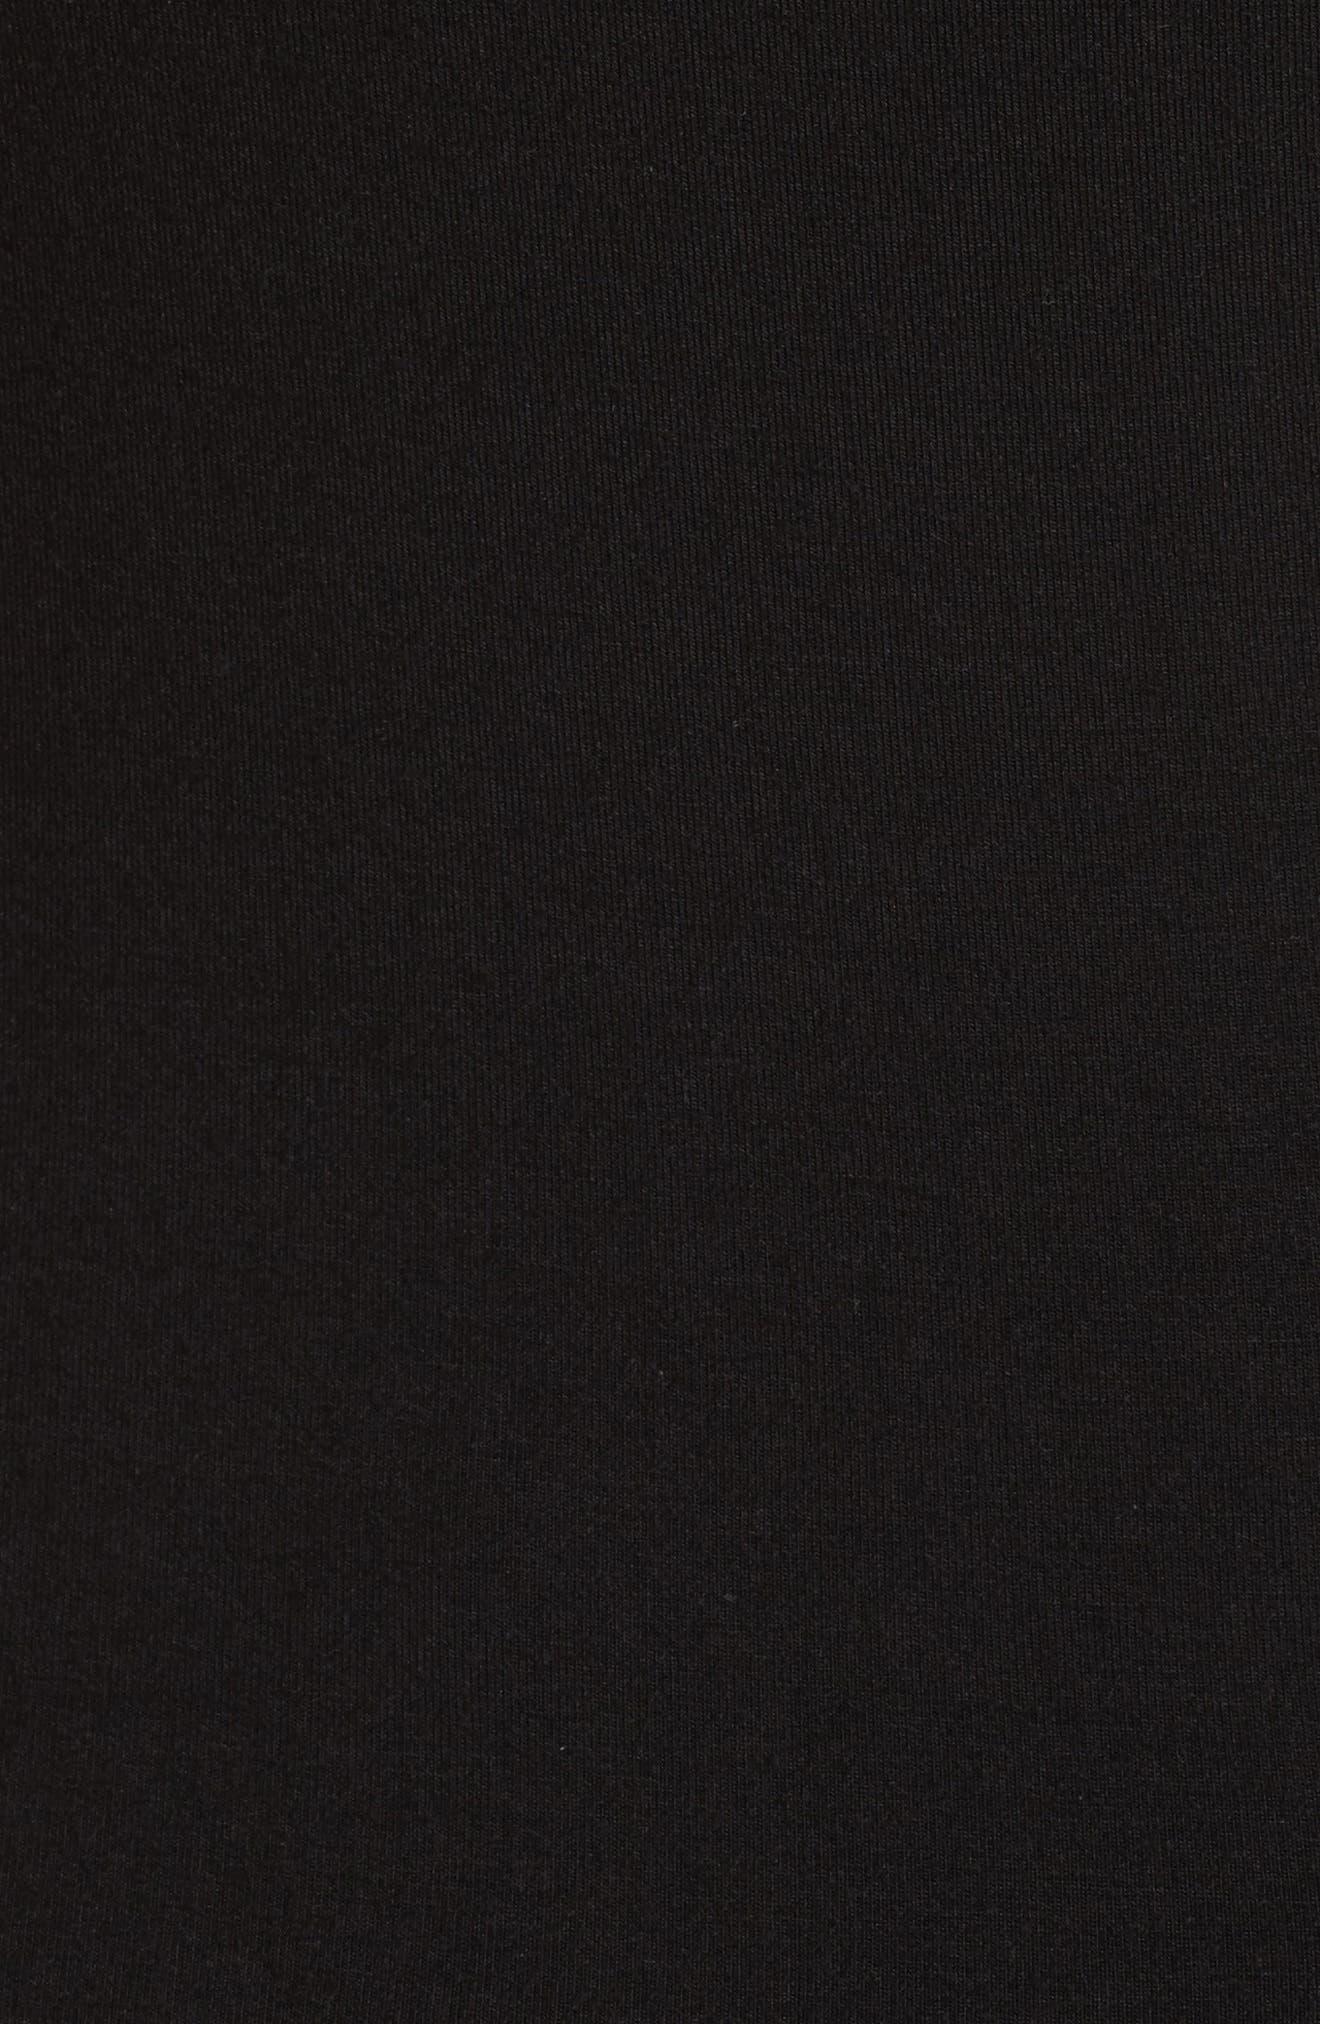 Asymmetrical Cutout Stretch Jersey Top,                             Alternate thumbnail 5, color,                             001